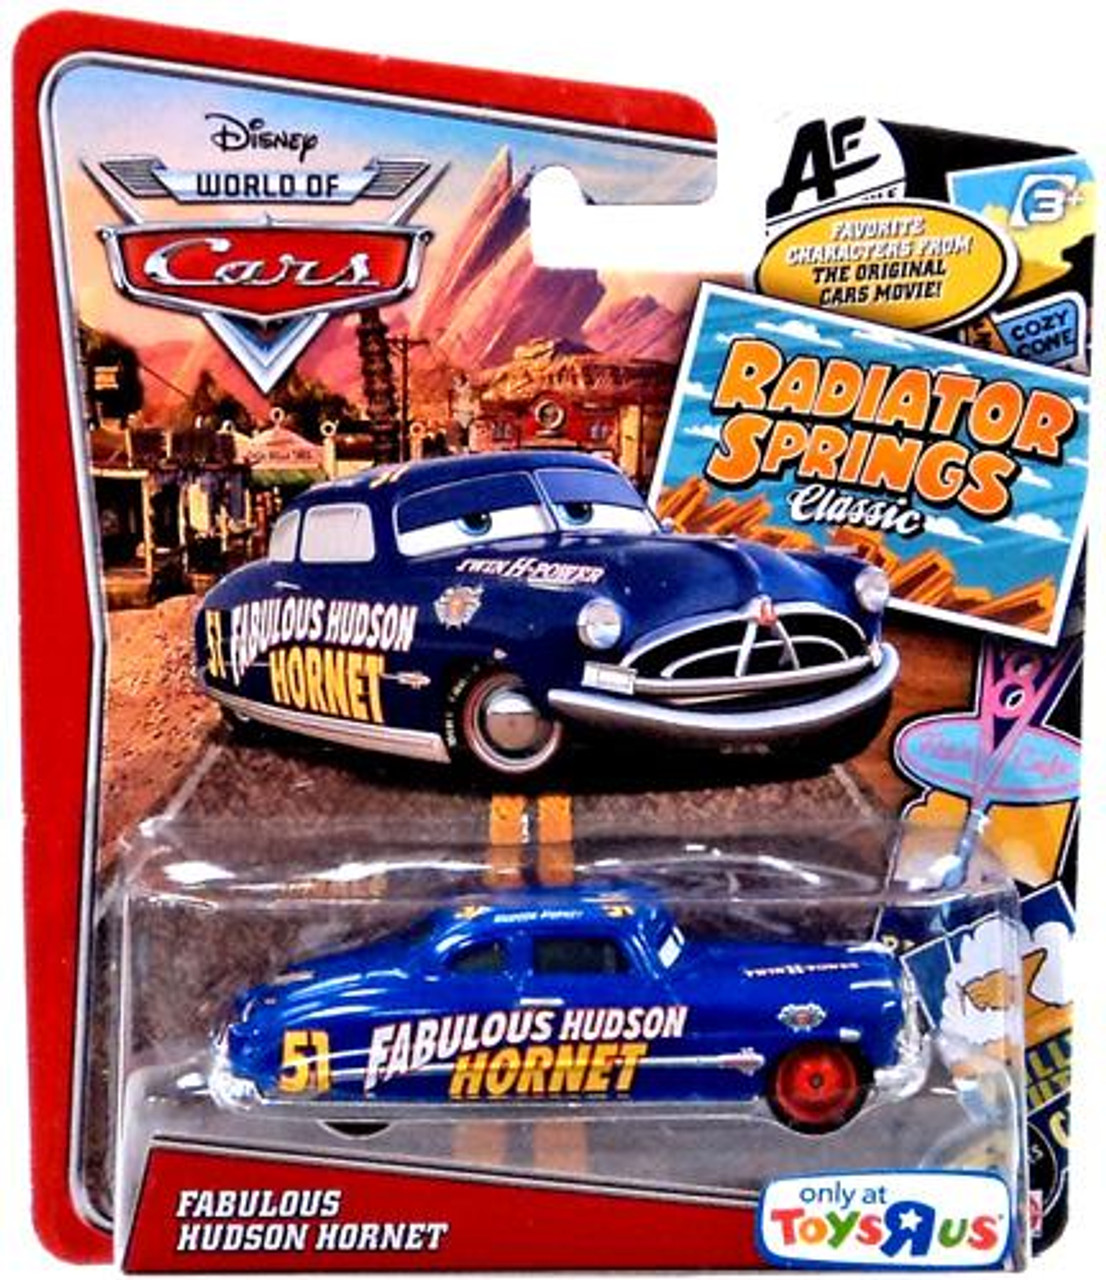 Disney Cars The World of Cars Radiator Springs Classic Fabulous Hudson Hornet Exclusive Diecast Car